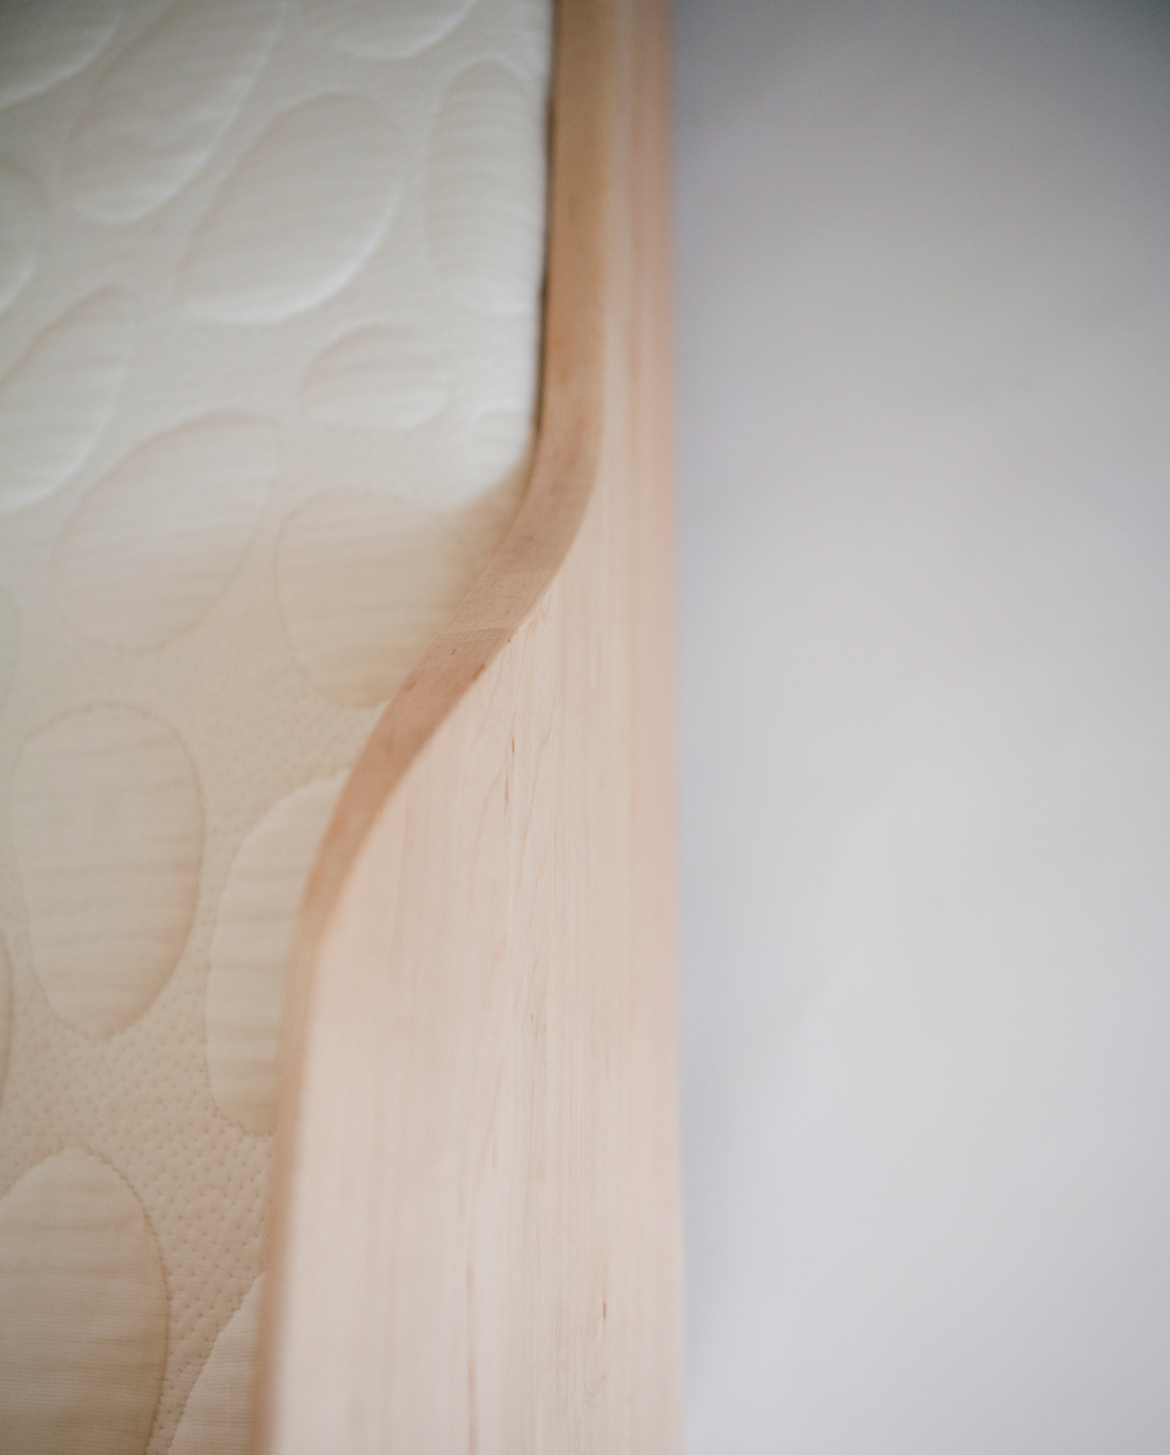 Echo Toddler Bed detail